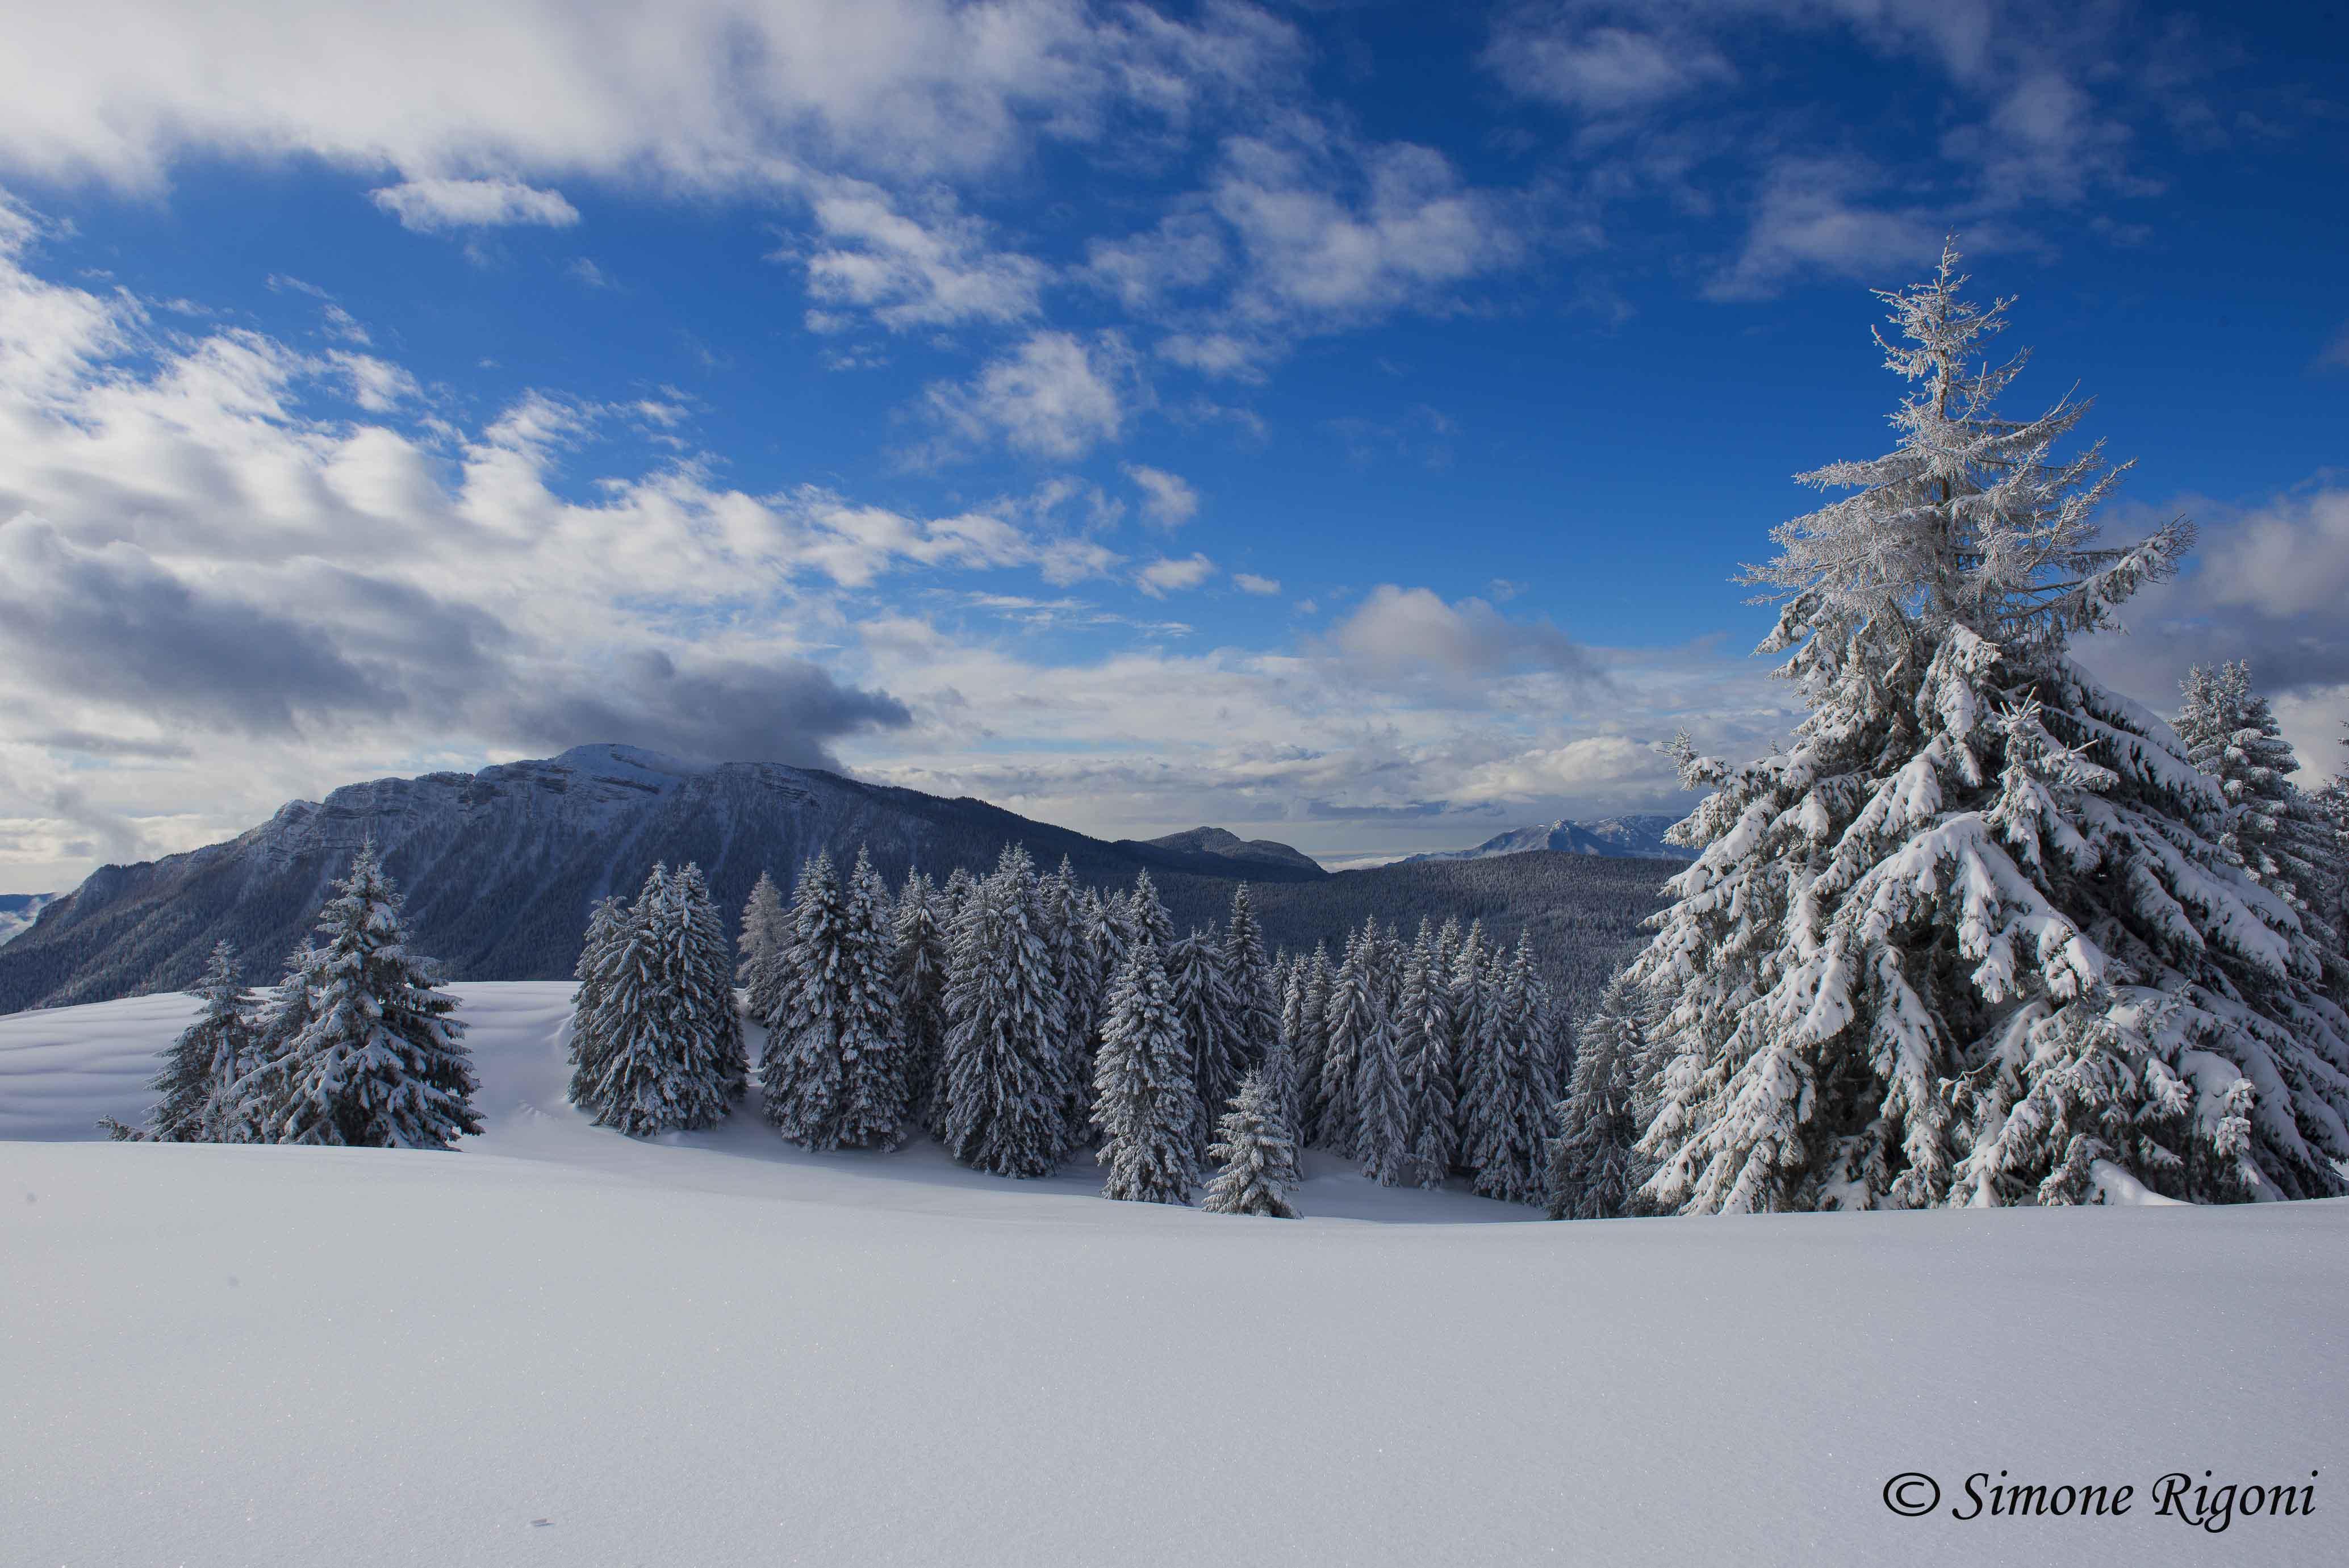 DSC_2957 Monte Verena